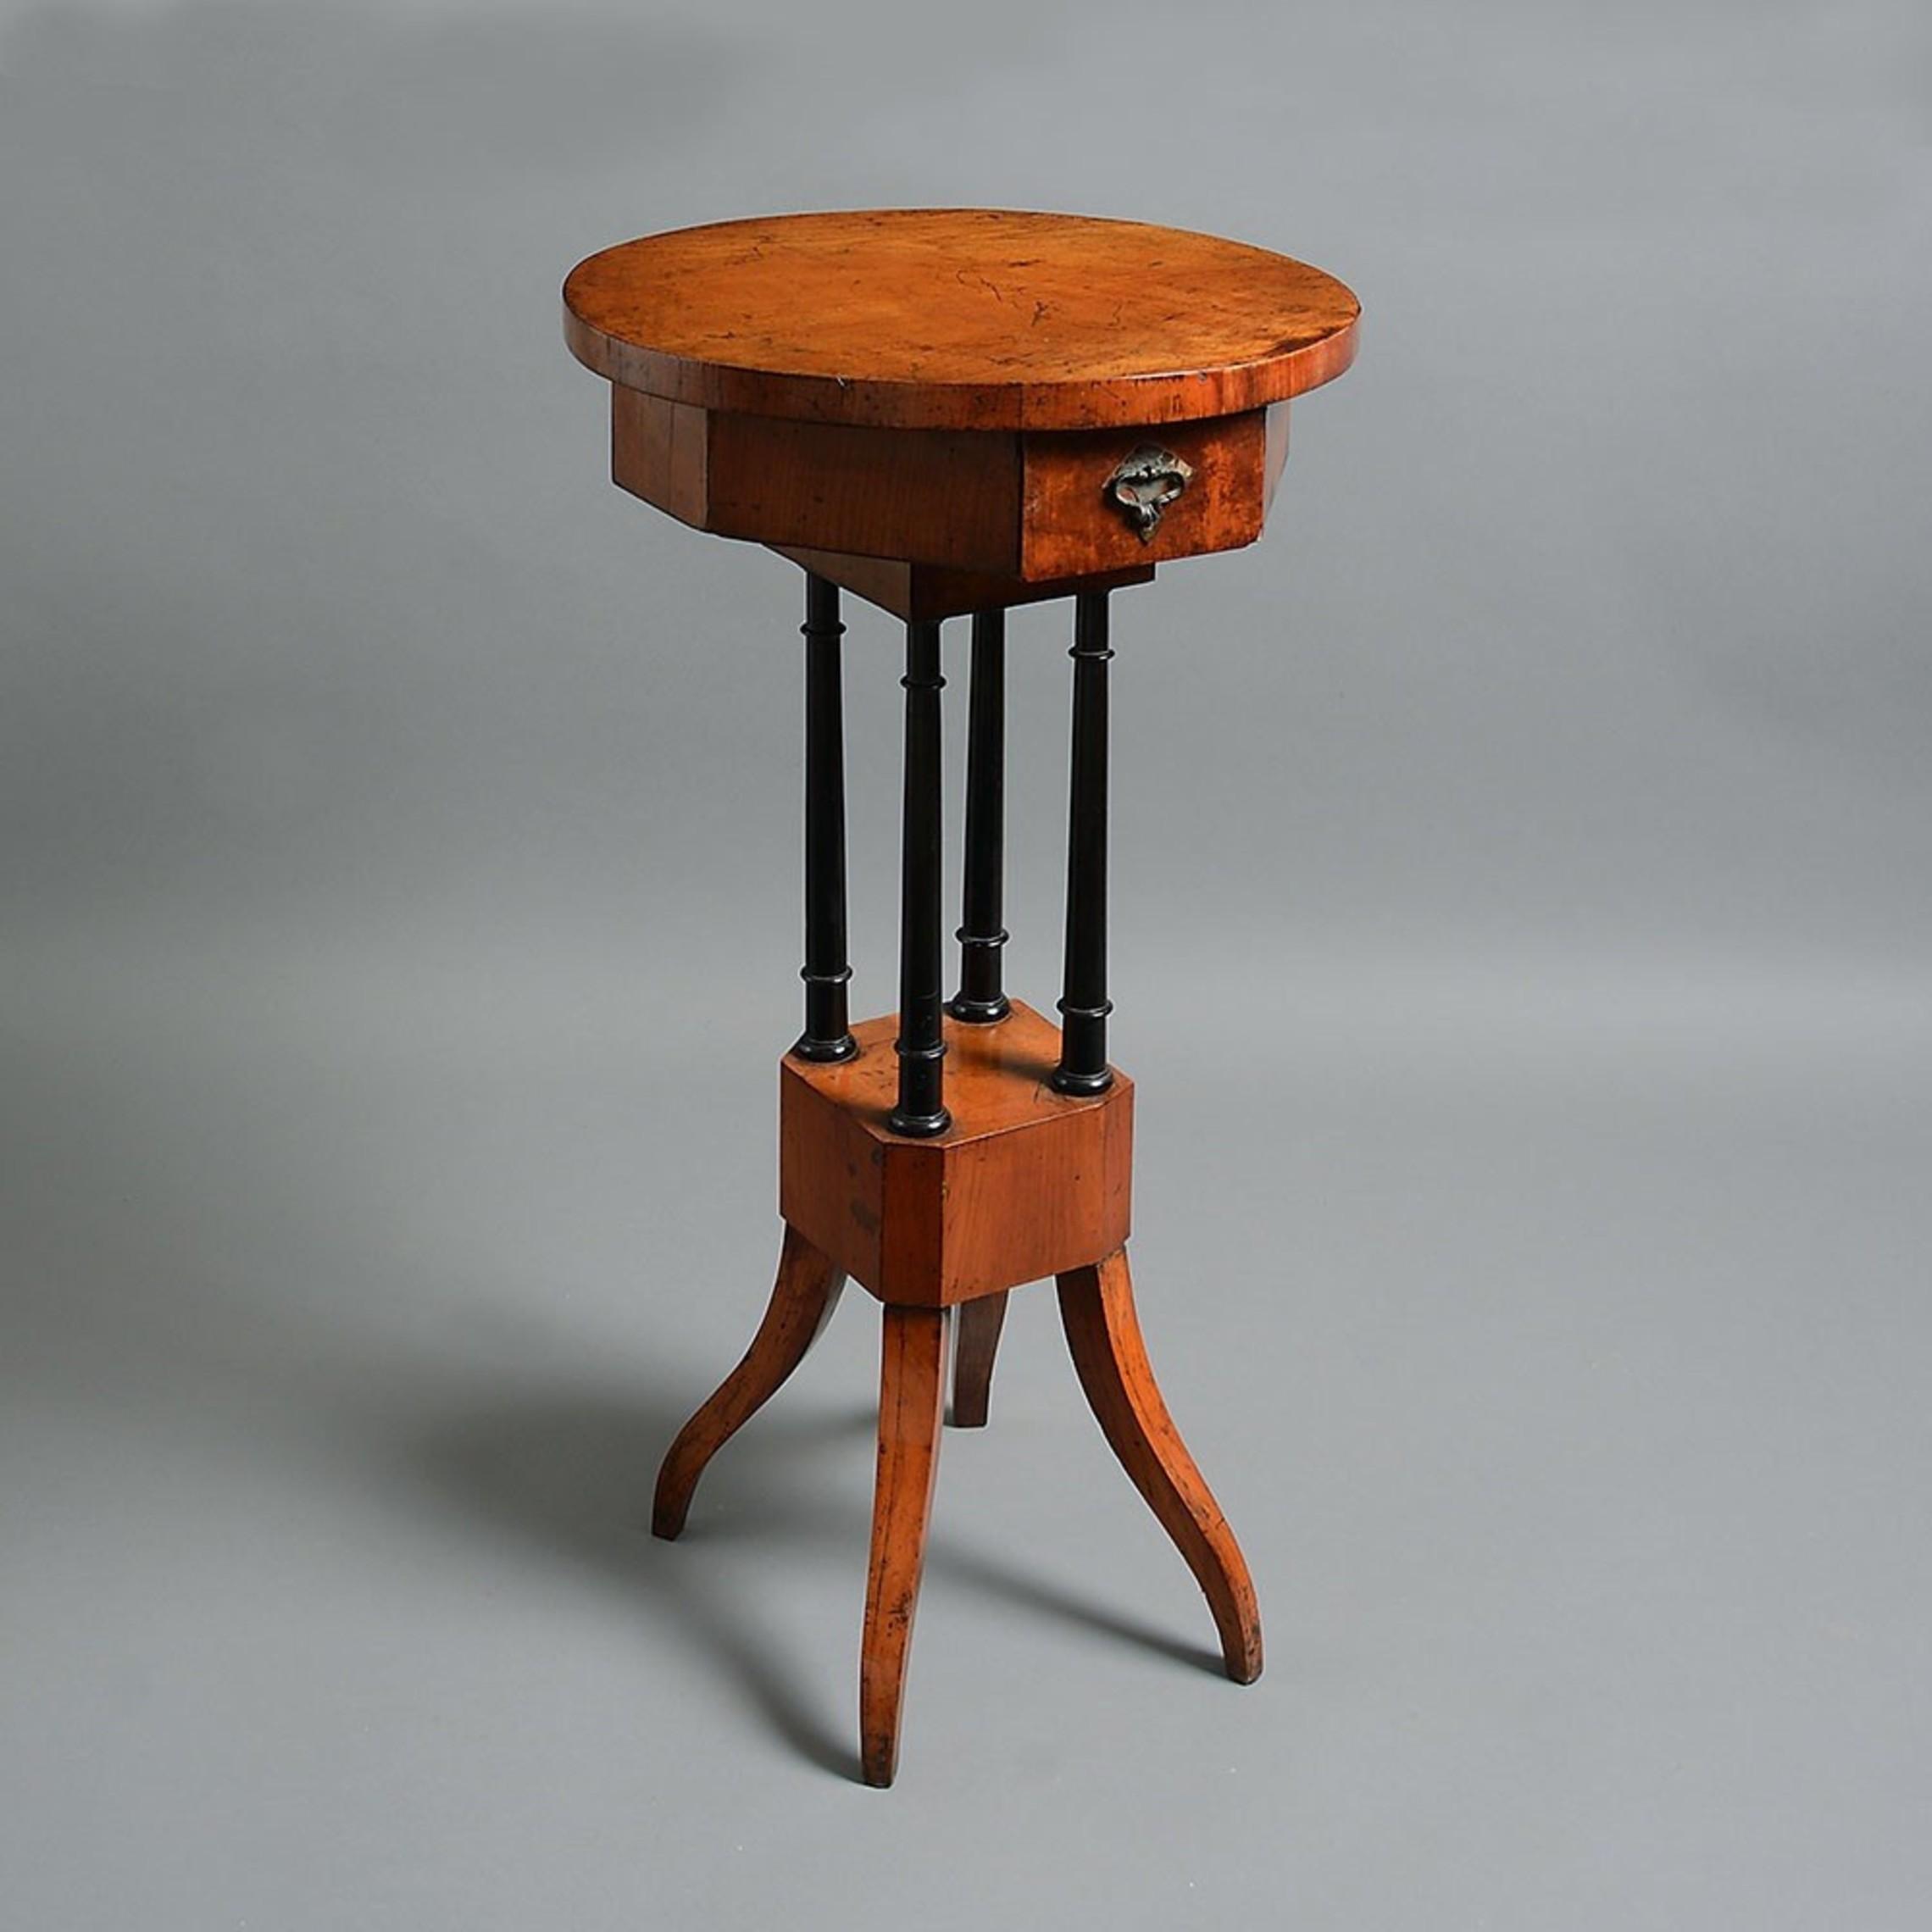 A Biedermeier Occasional Table